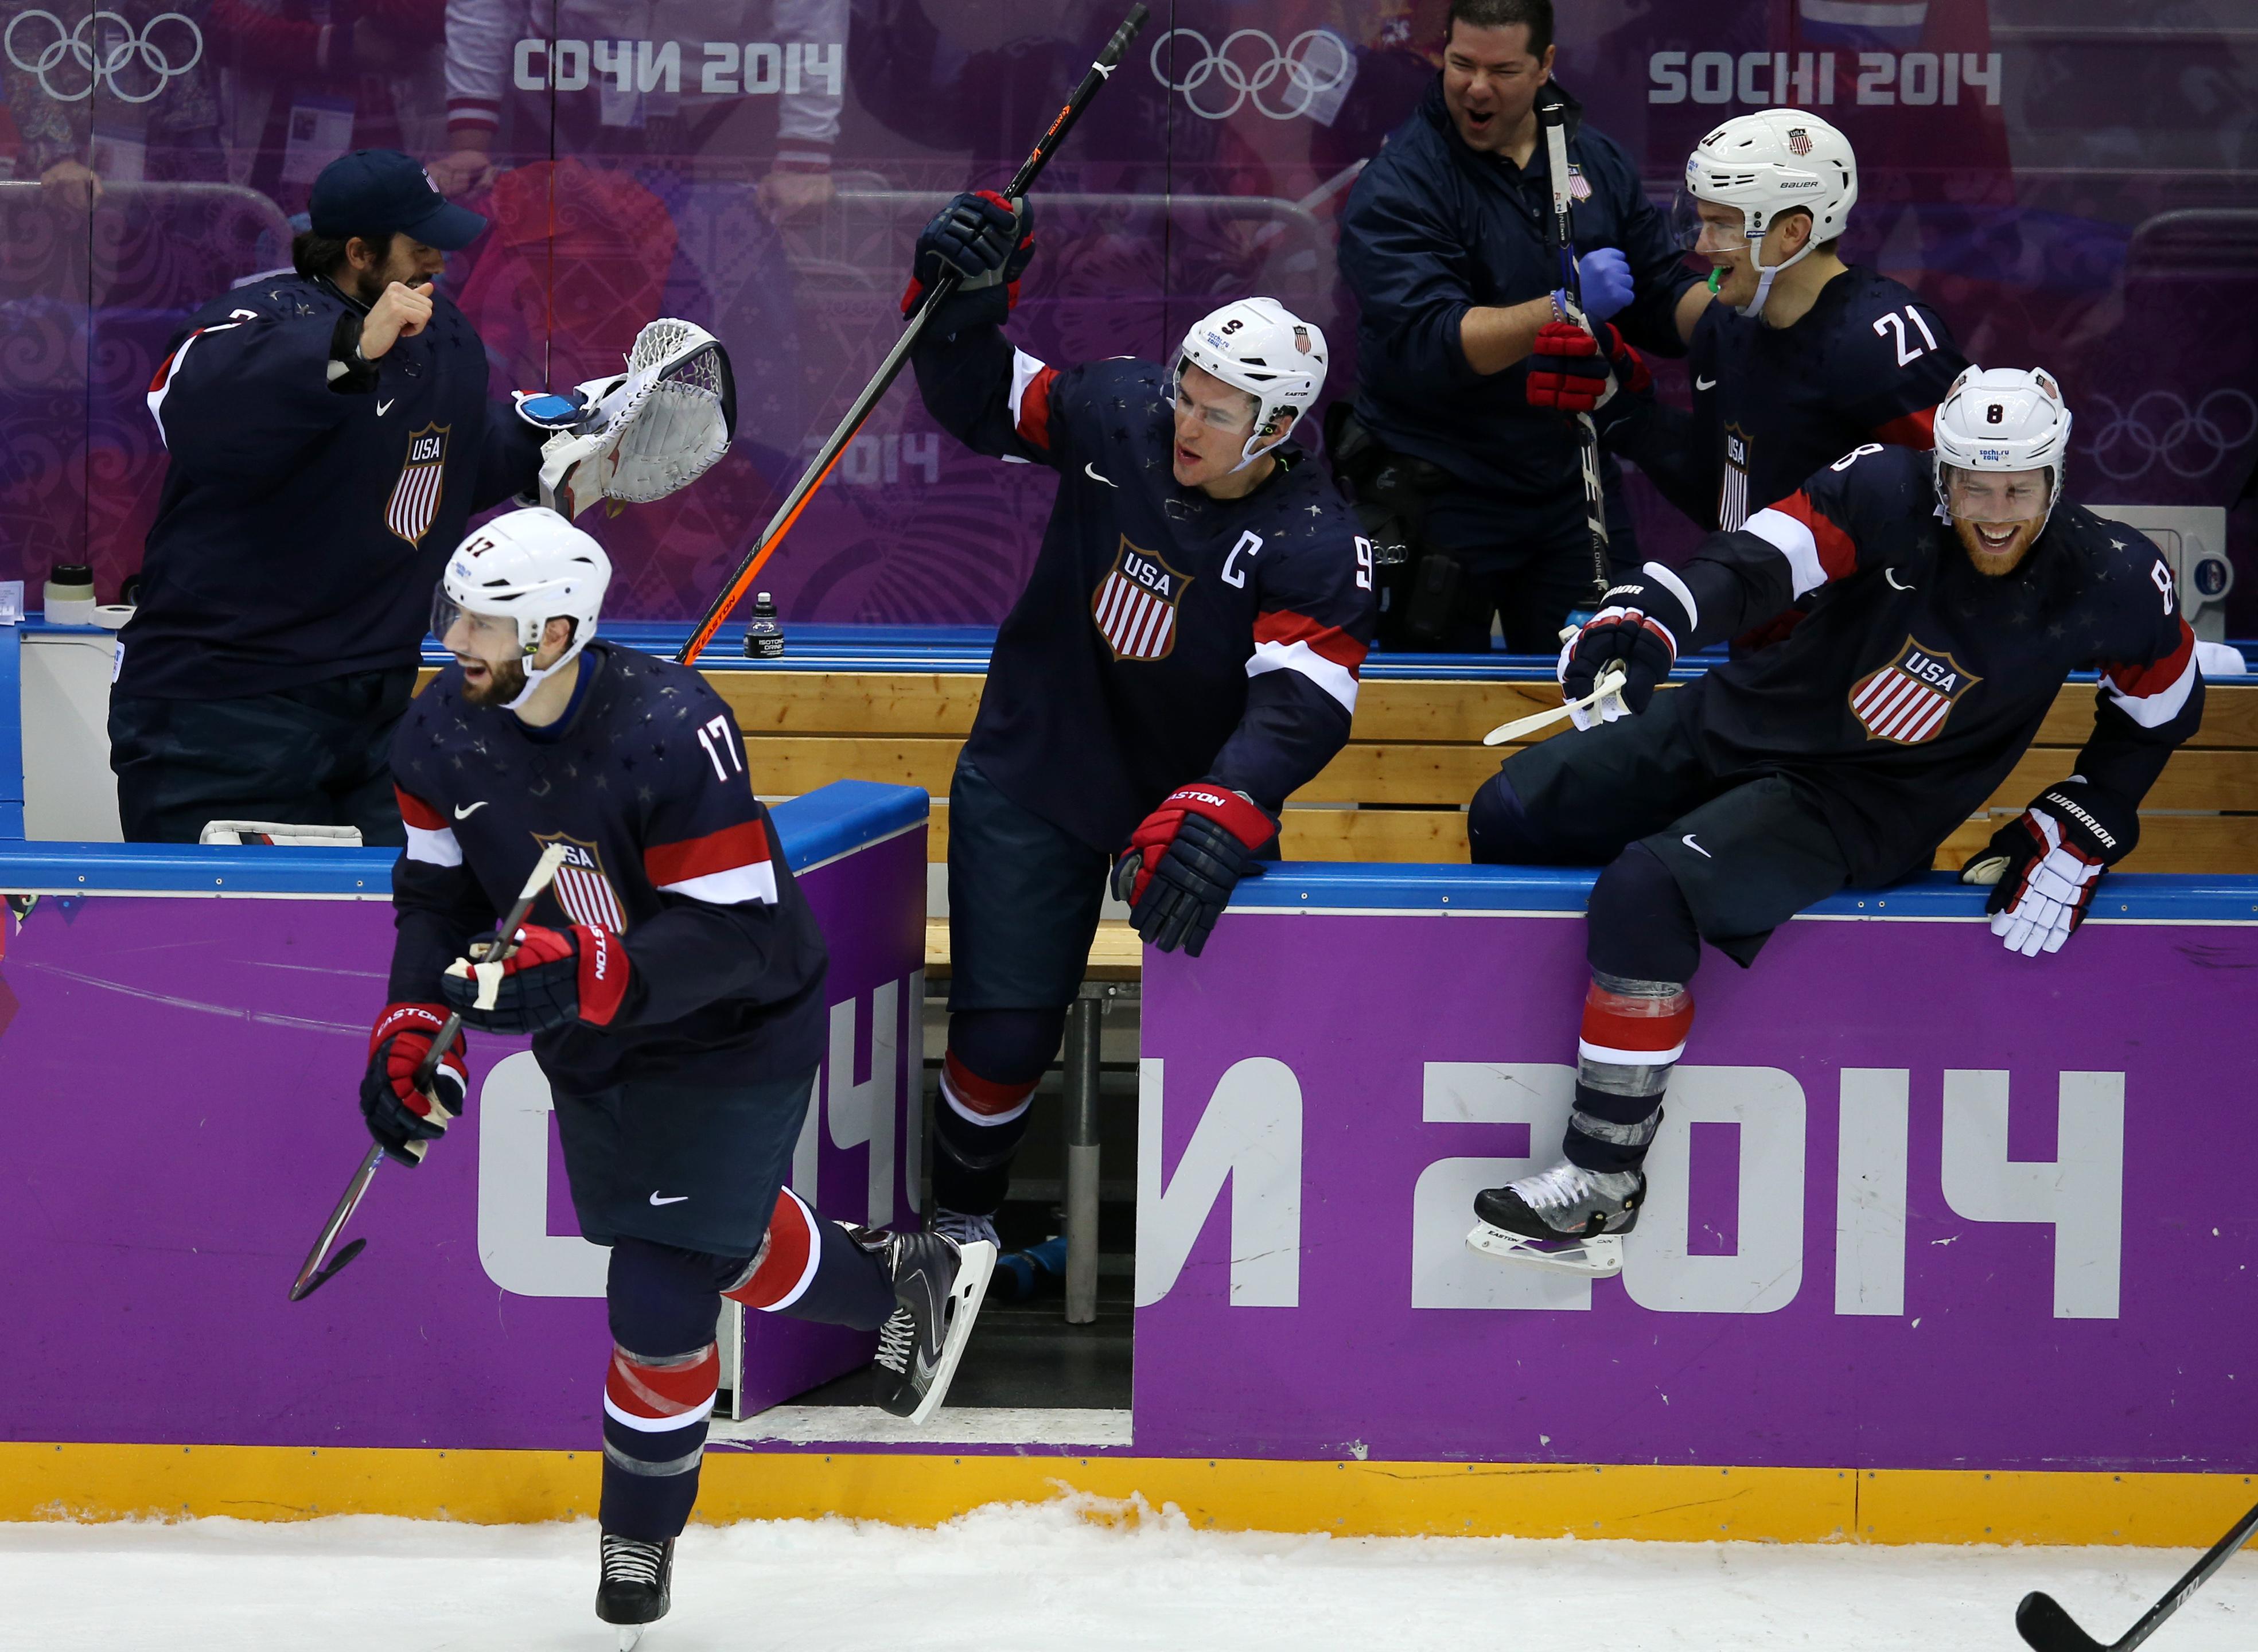 Olympic Winter Games Sochi 2014